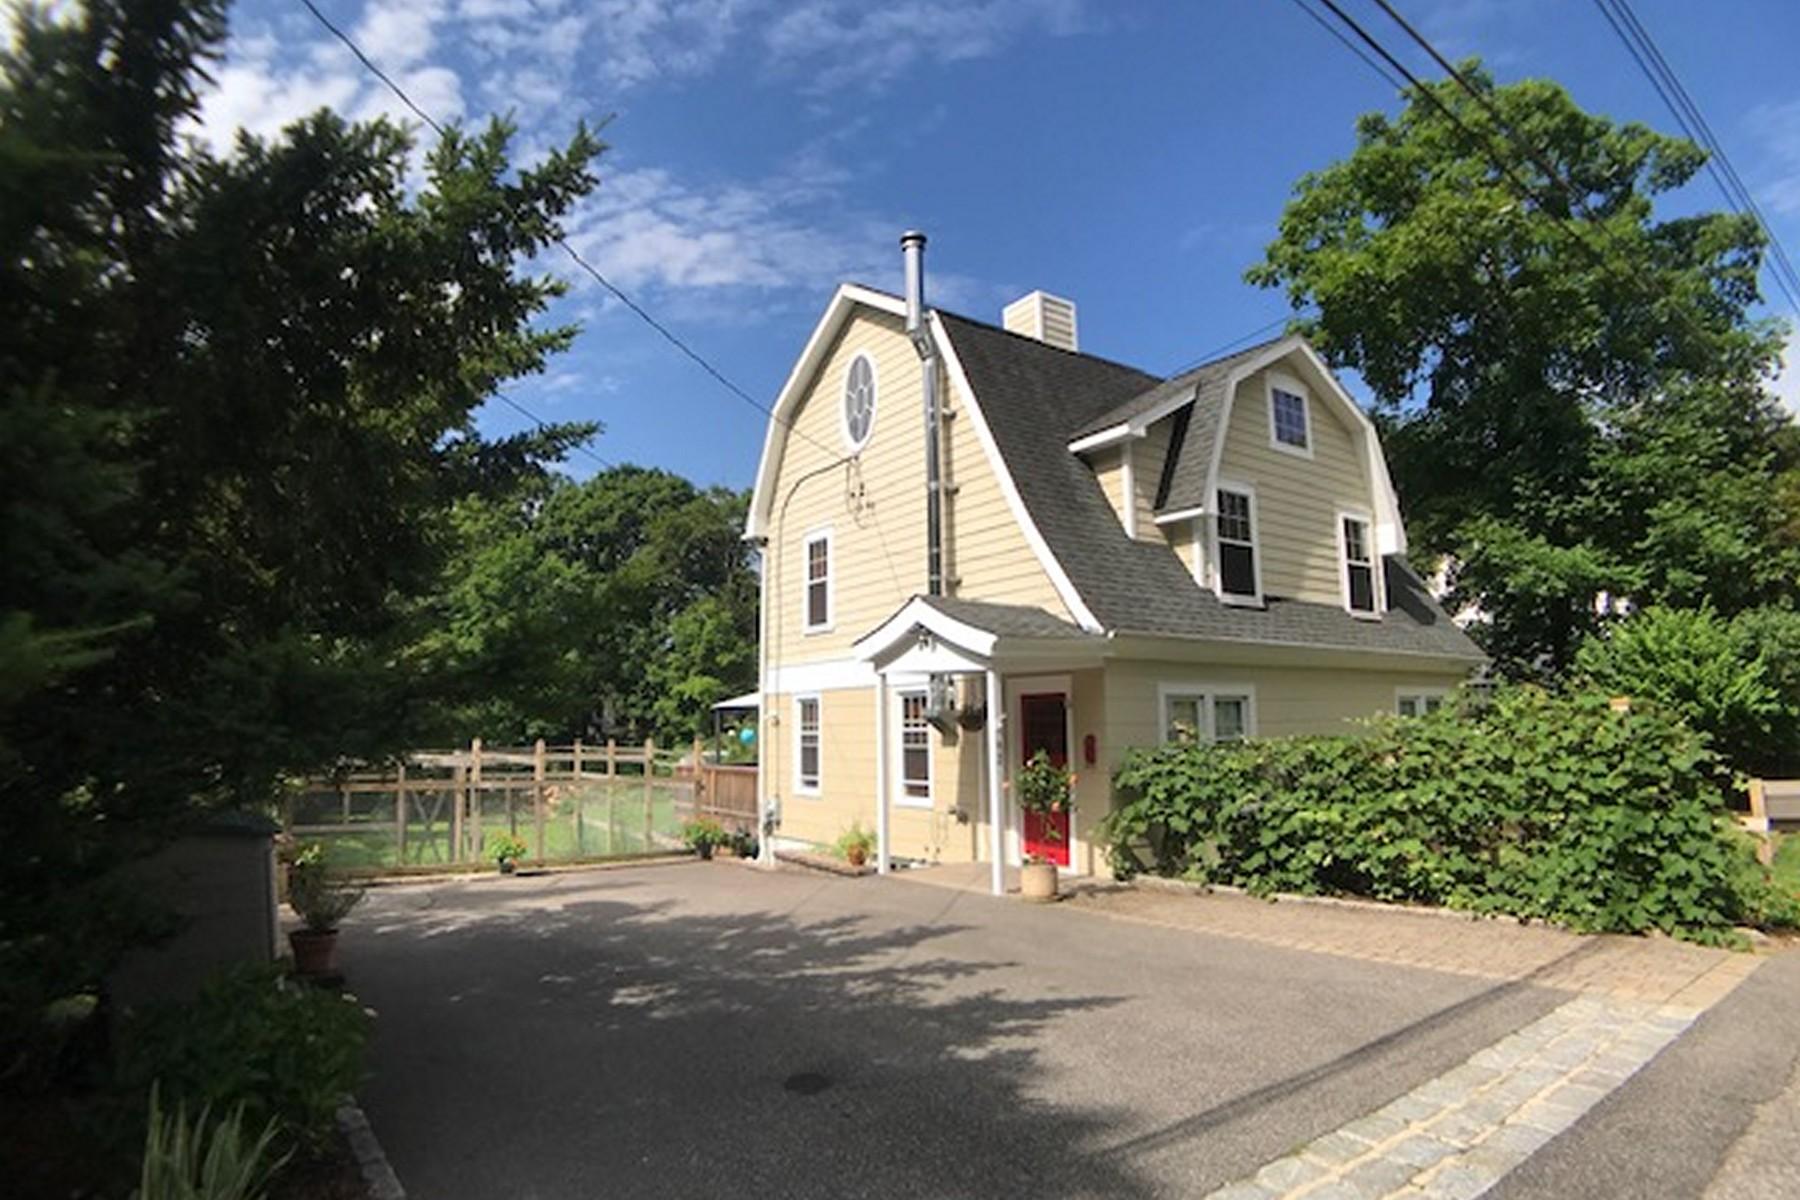 Single Family Homes für Verkauf beim Tuscany in Chappaqua! 92 Ridgewood Terrace, Chappaqua, New York 10514 Vereinigte Staaten